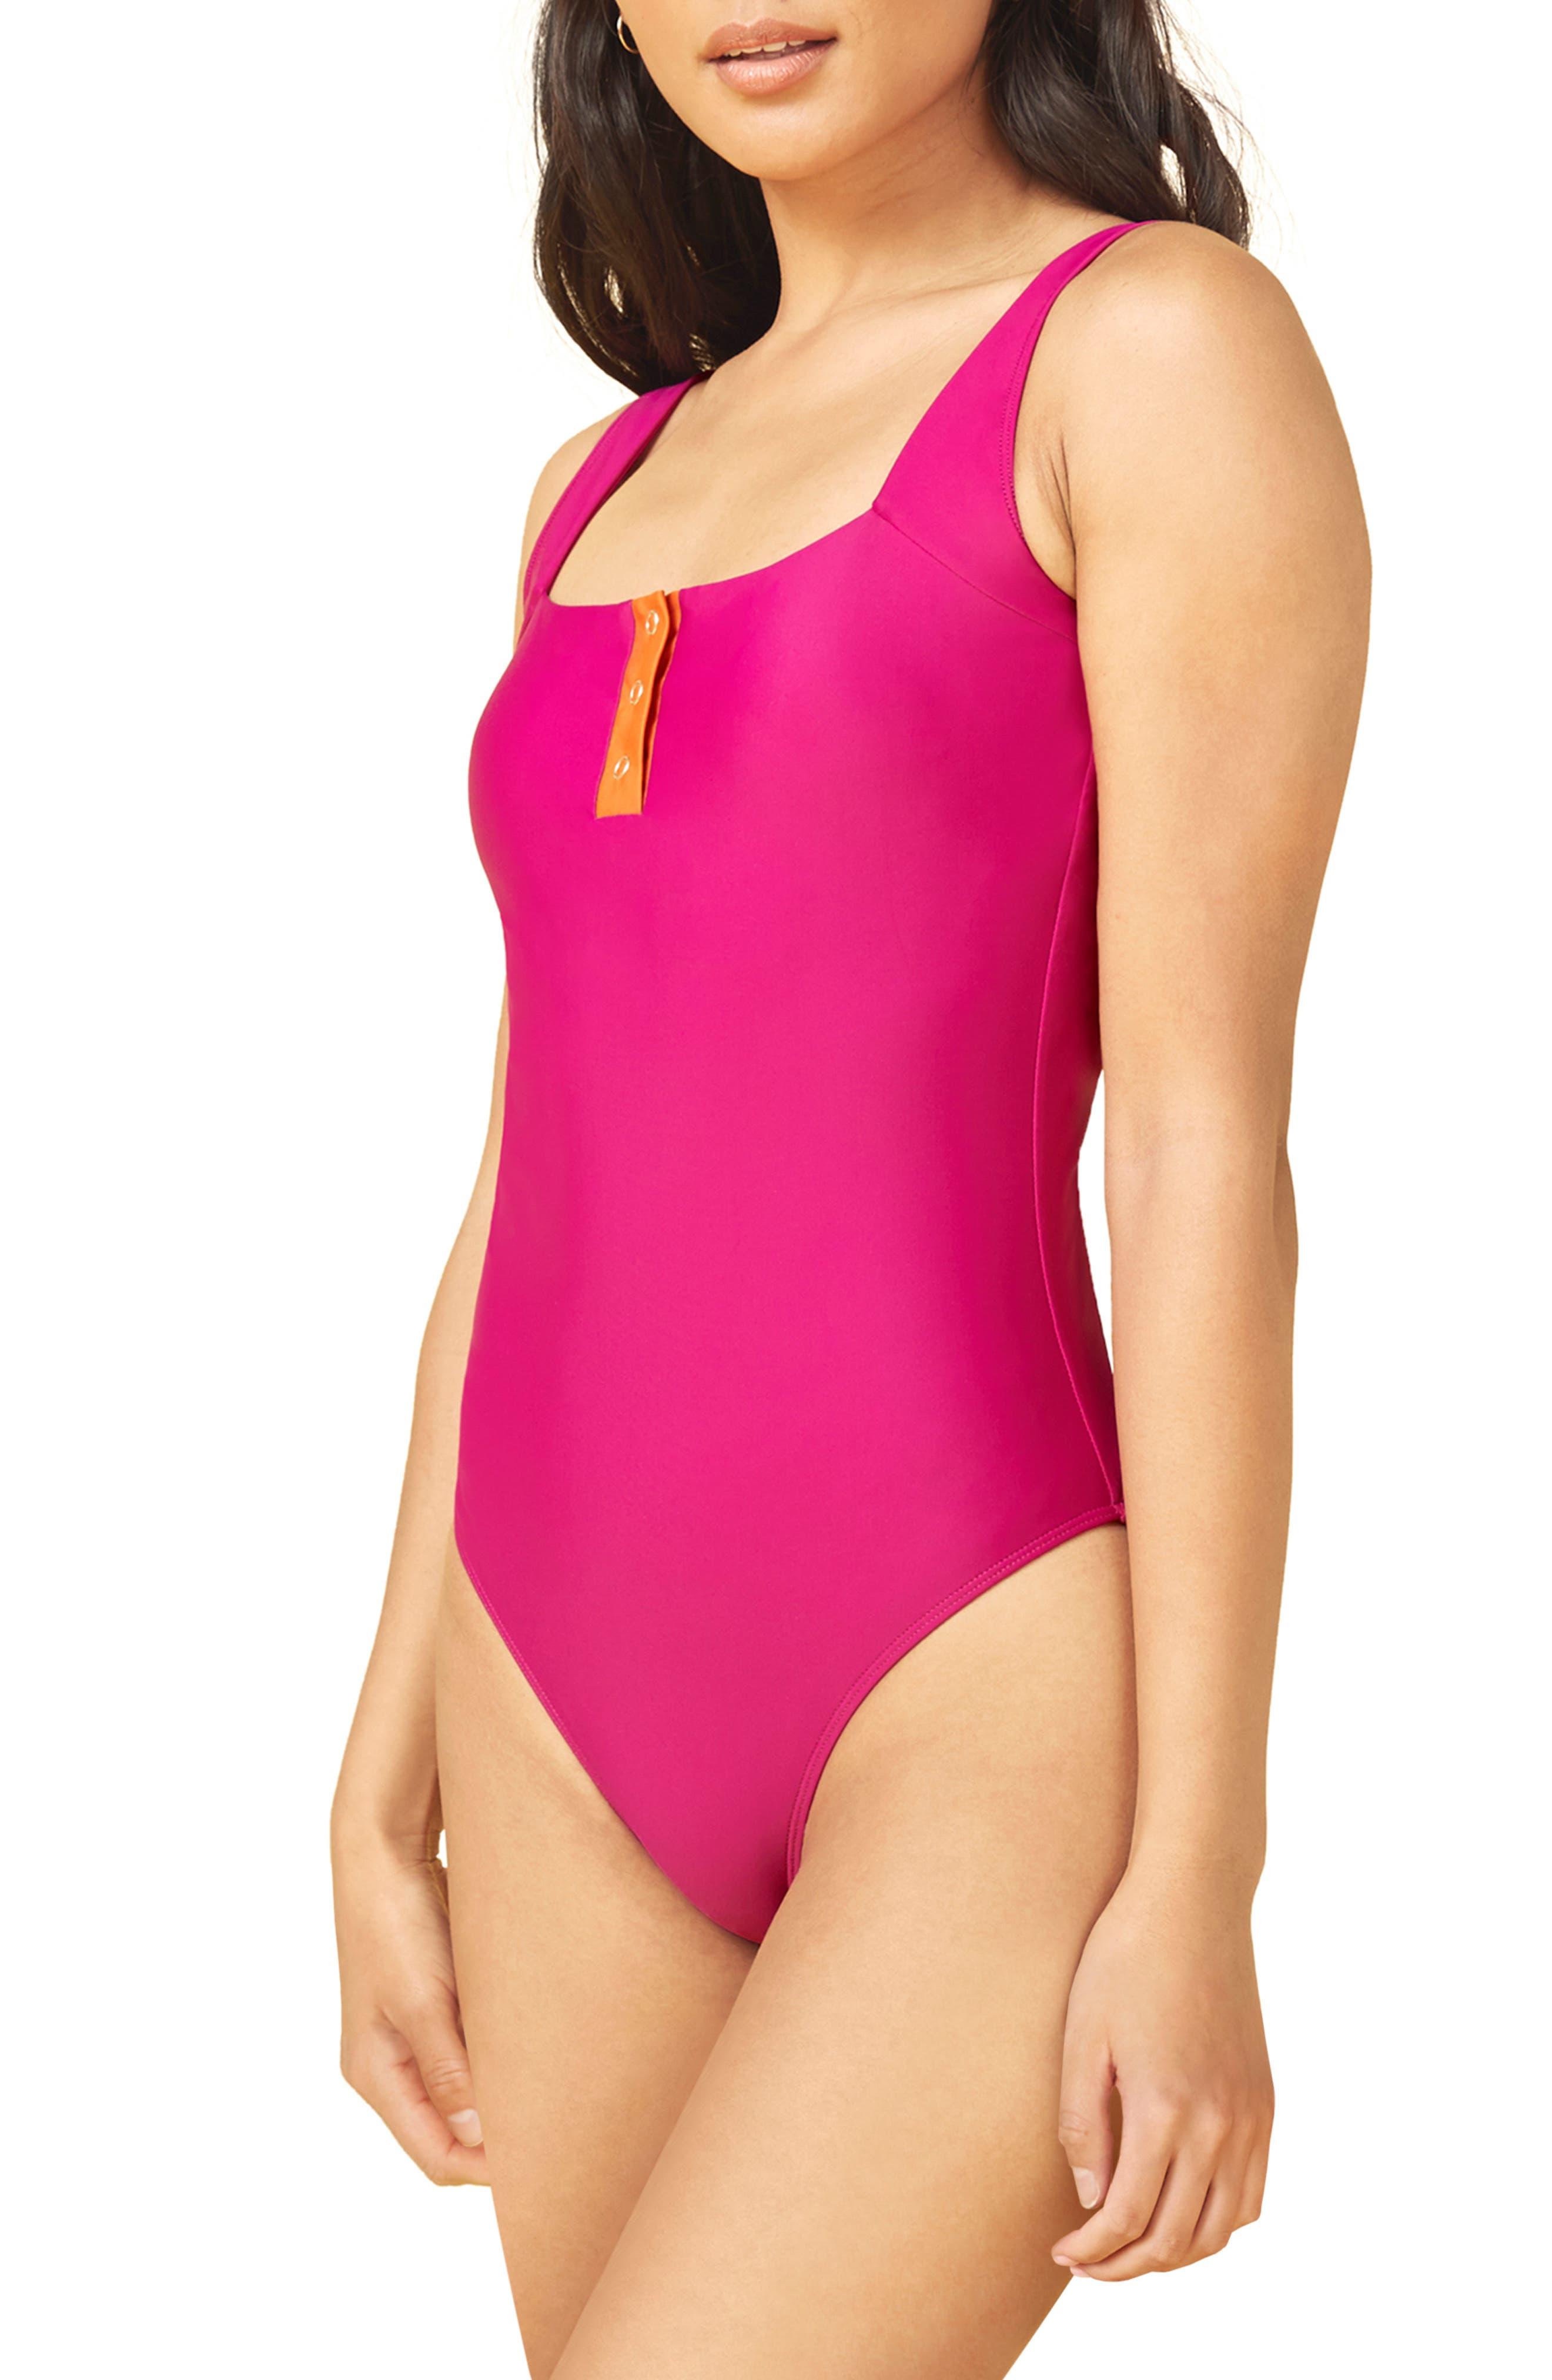 Summersalt The Sailor One-Piece Swimsuit